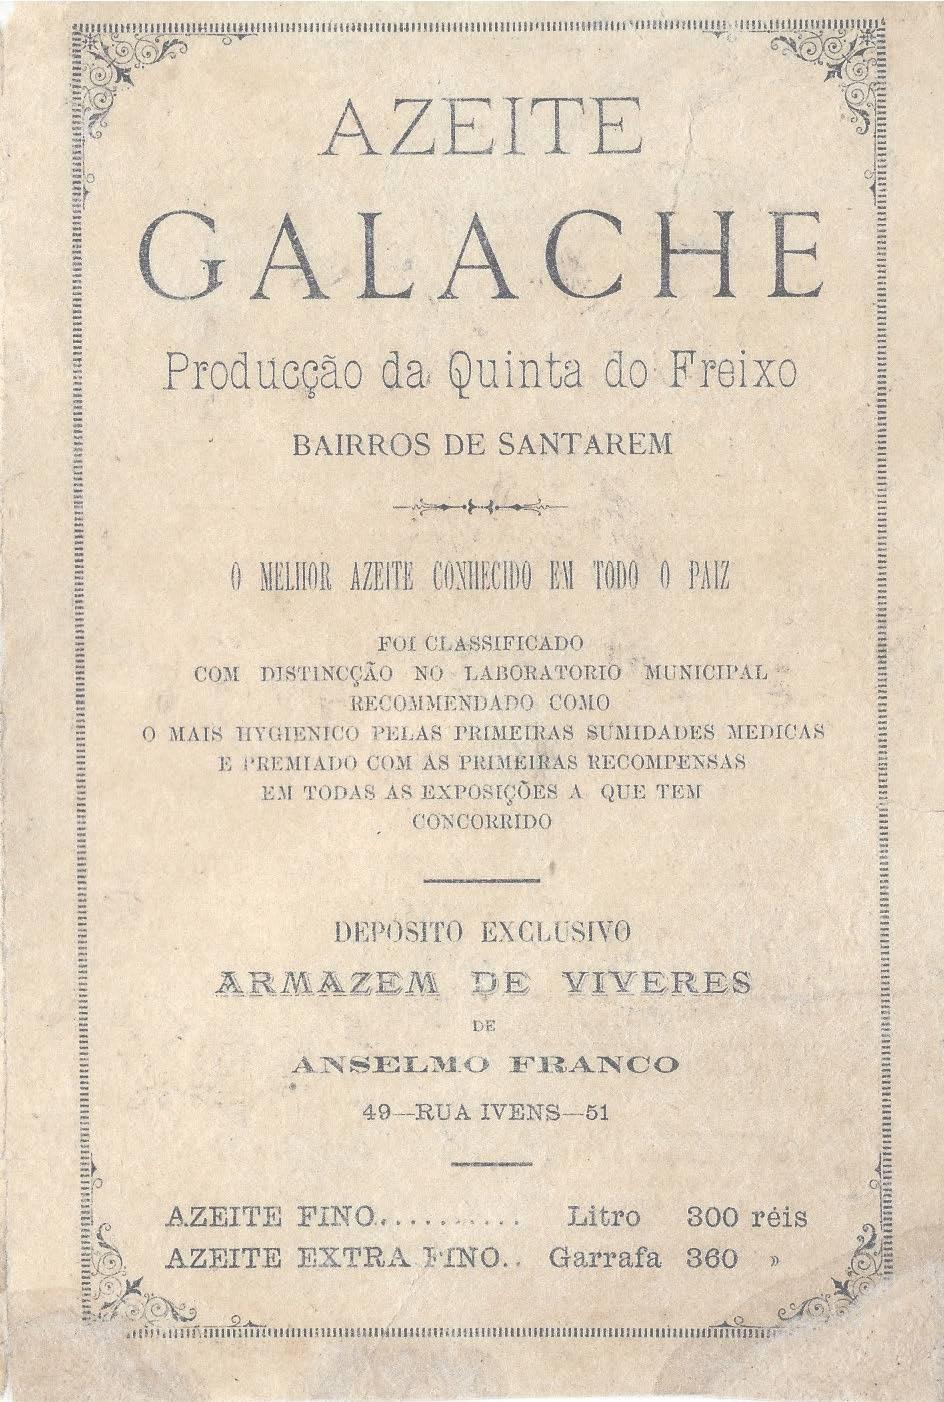 AZEITE GALACHE_Pagina_1